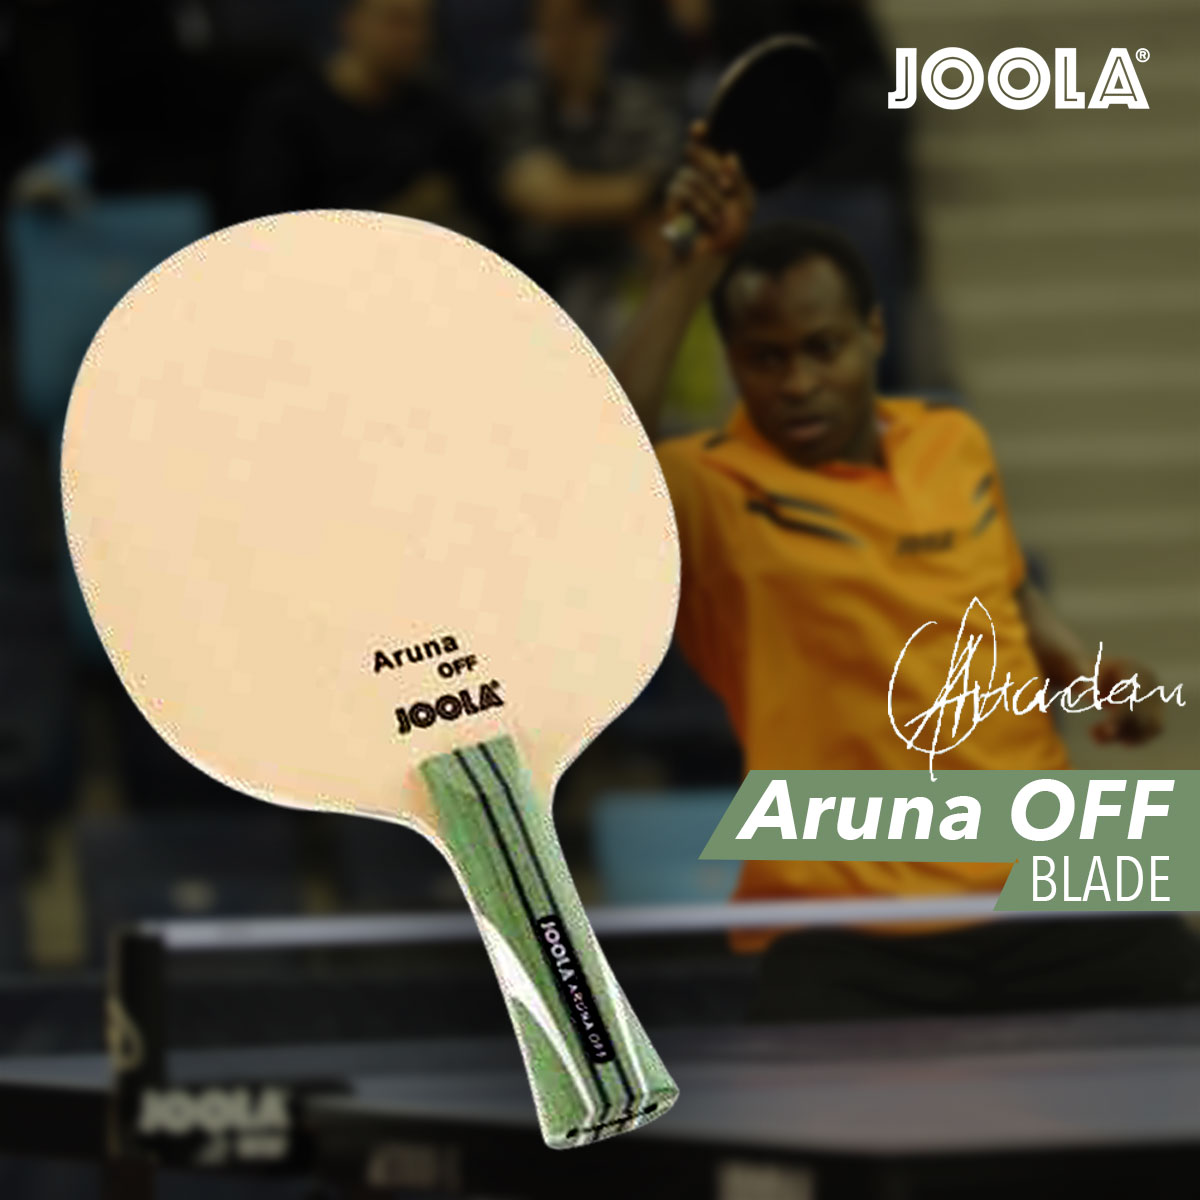 The JOOLA Aruna off, Matt Hetherington's table tennis blade of choice